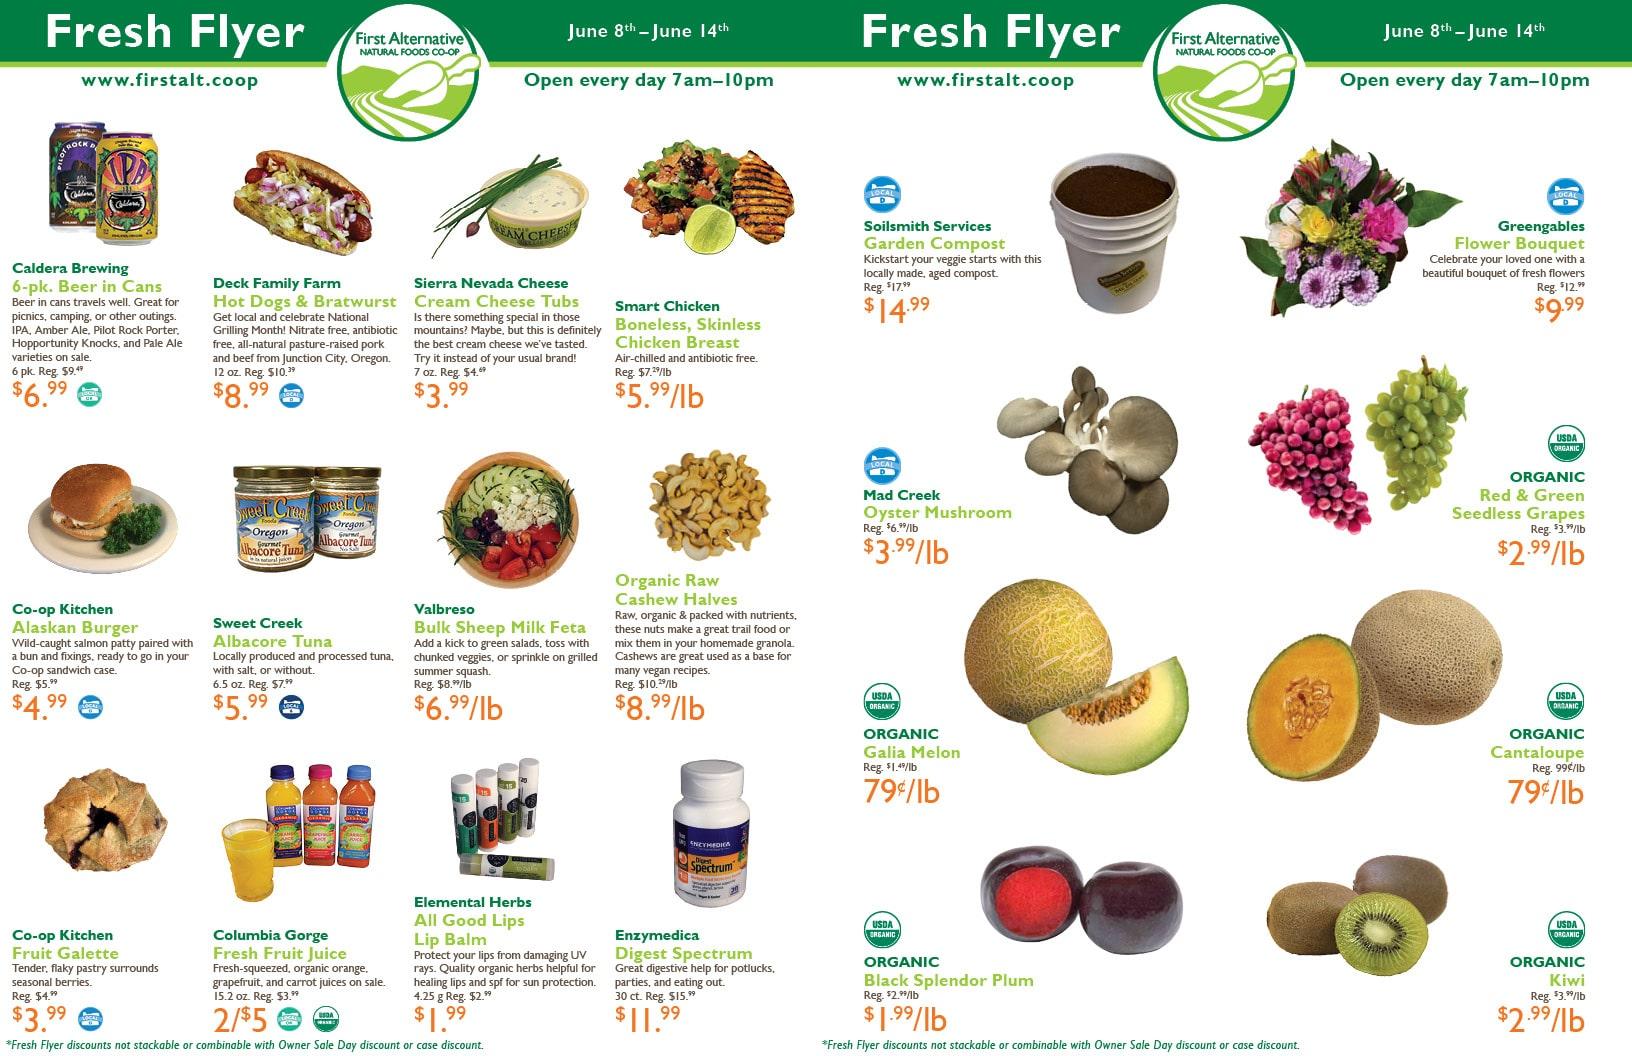 First Alternative Fresh Flyer June 8-14